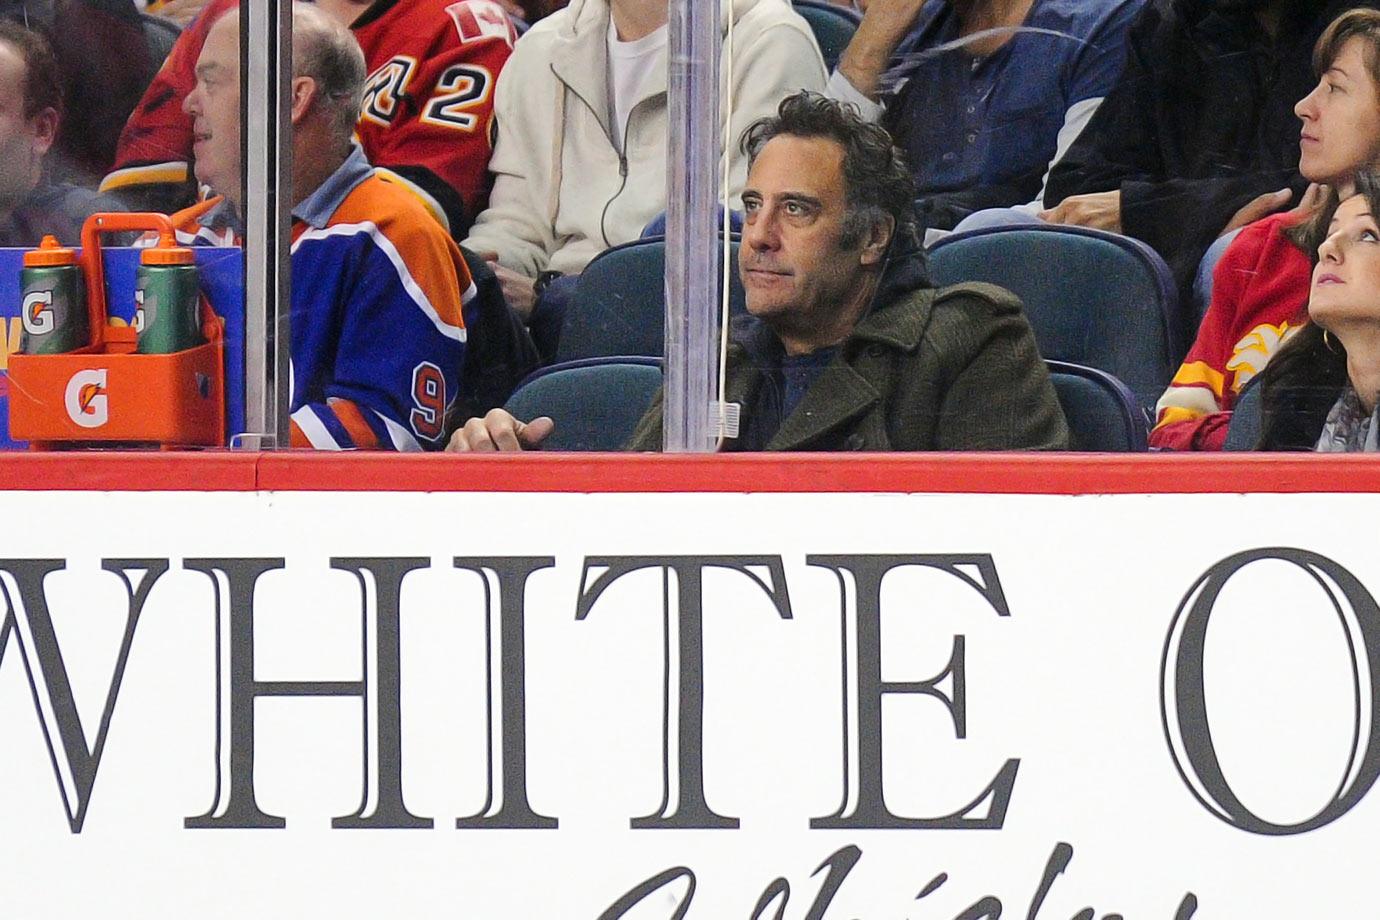 Jan. 24, 2015: Calgary Flames vs. Edmonton Oilers at Scotiabank Saddledome in Calgary